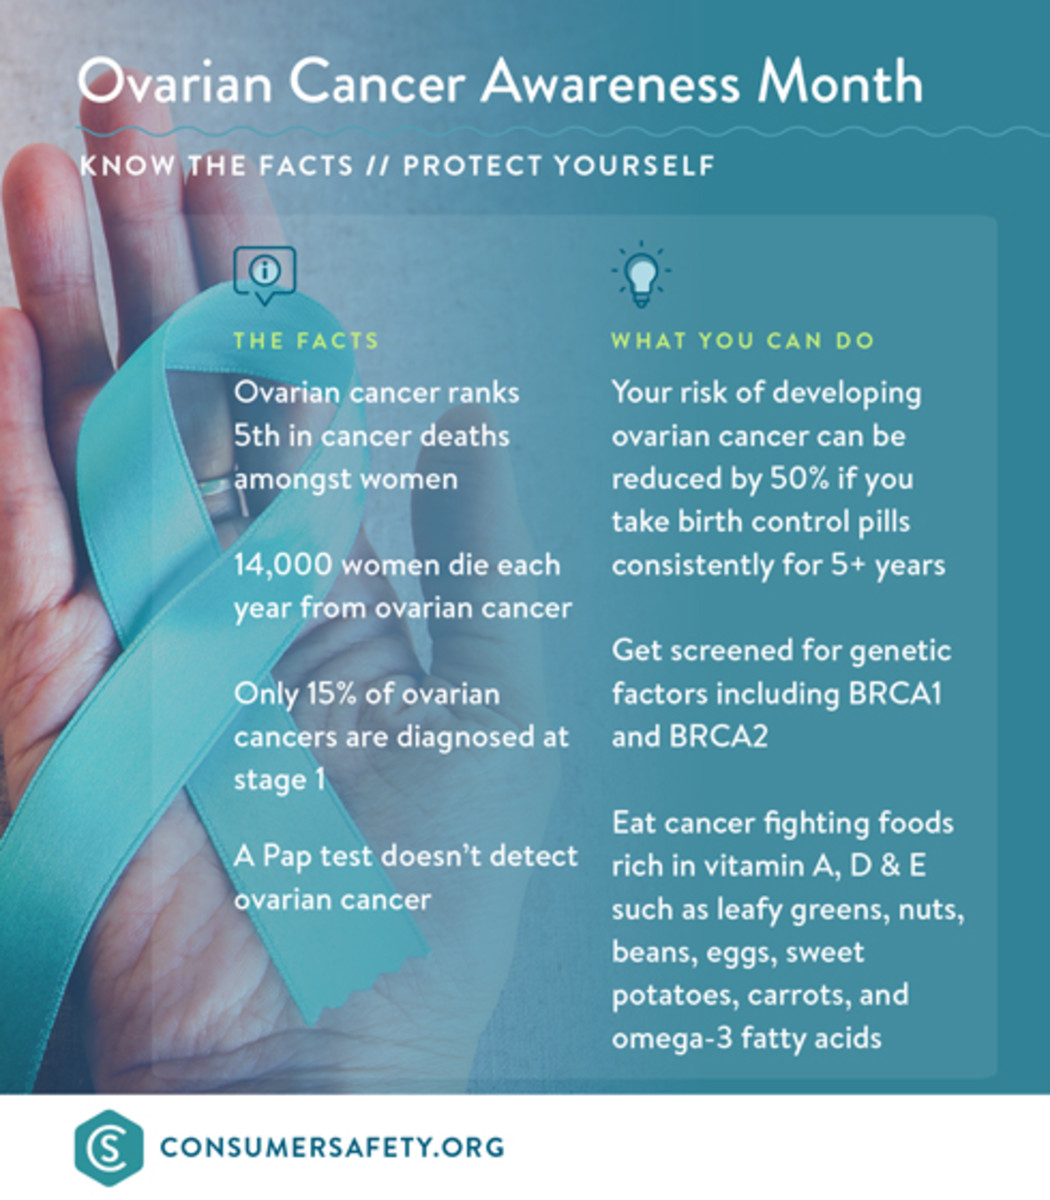 OvarianCancerFactsandTips